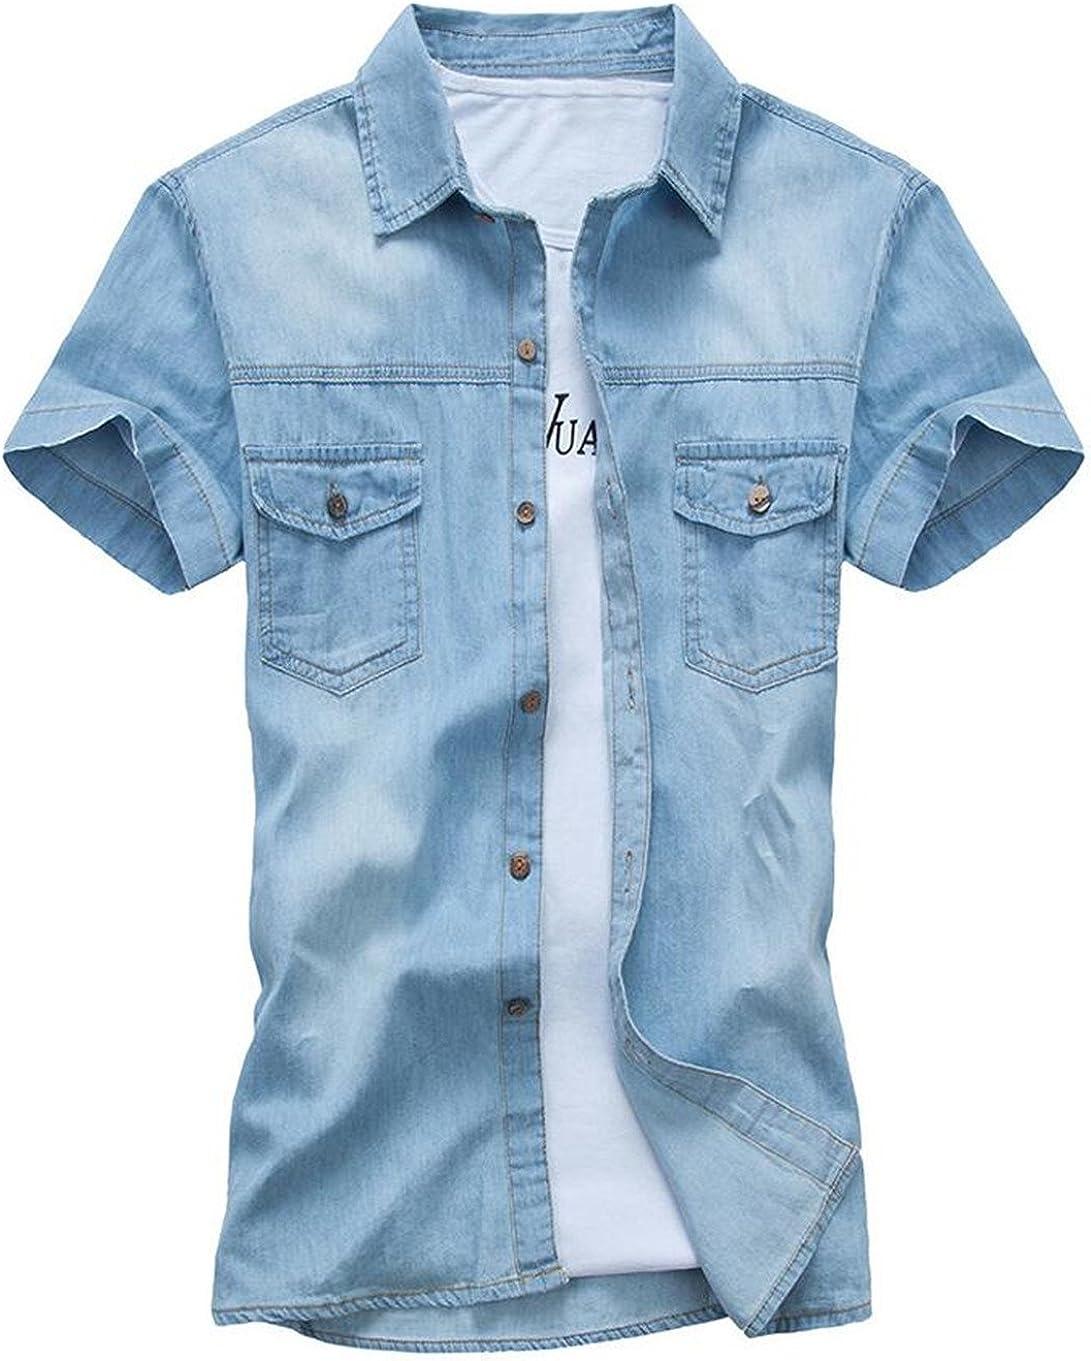 RRINSINS Men Summer Shirt Short Sleeve Fashion Western Plaid Button Down Shirt